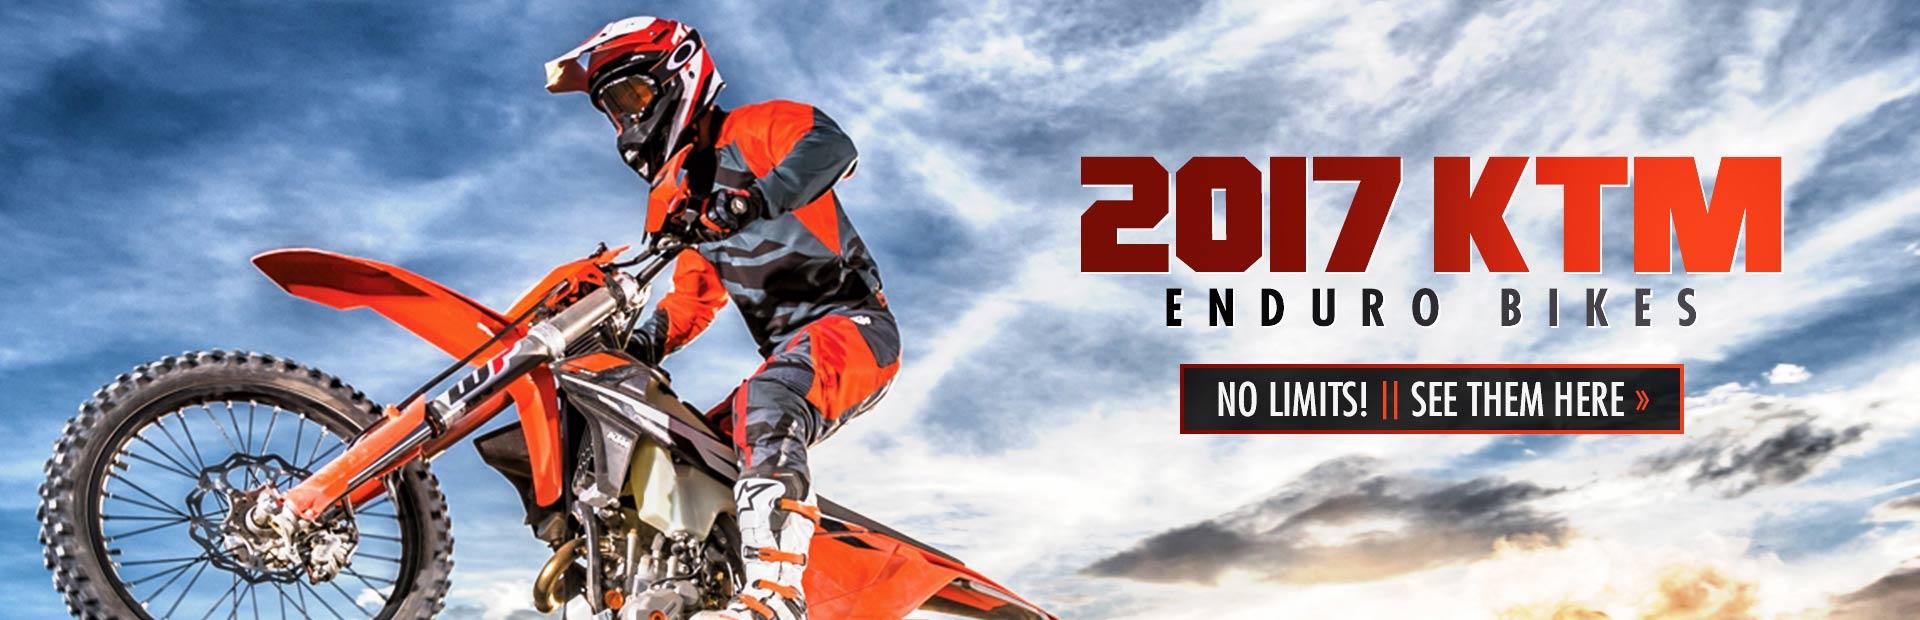 2017 KTM Enduro Bikes: Click here to view the models.